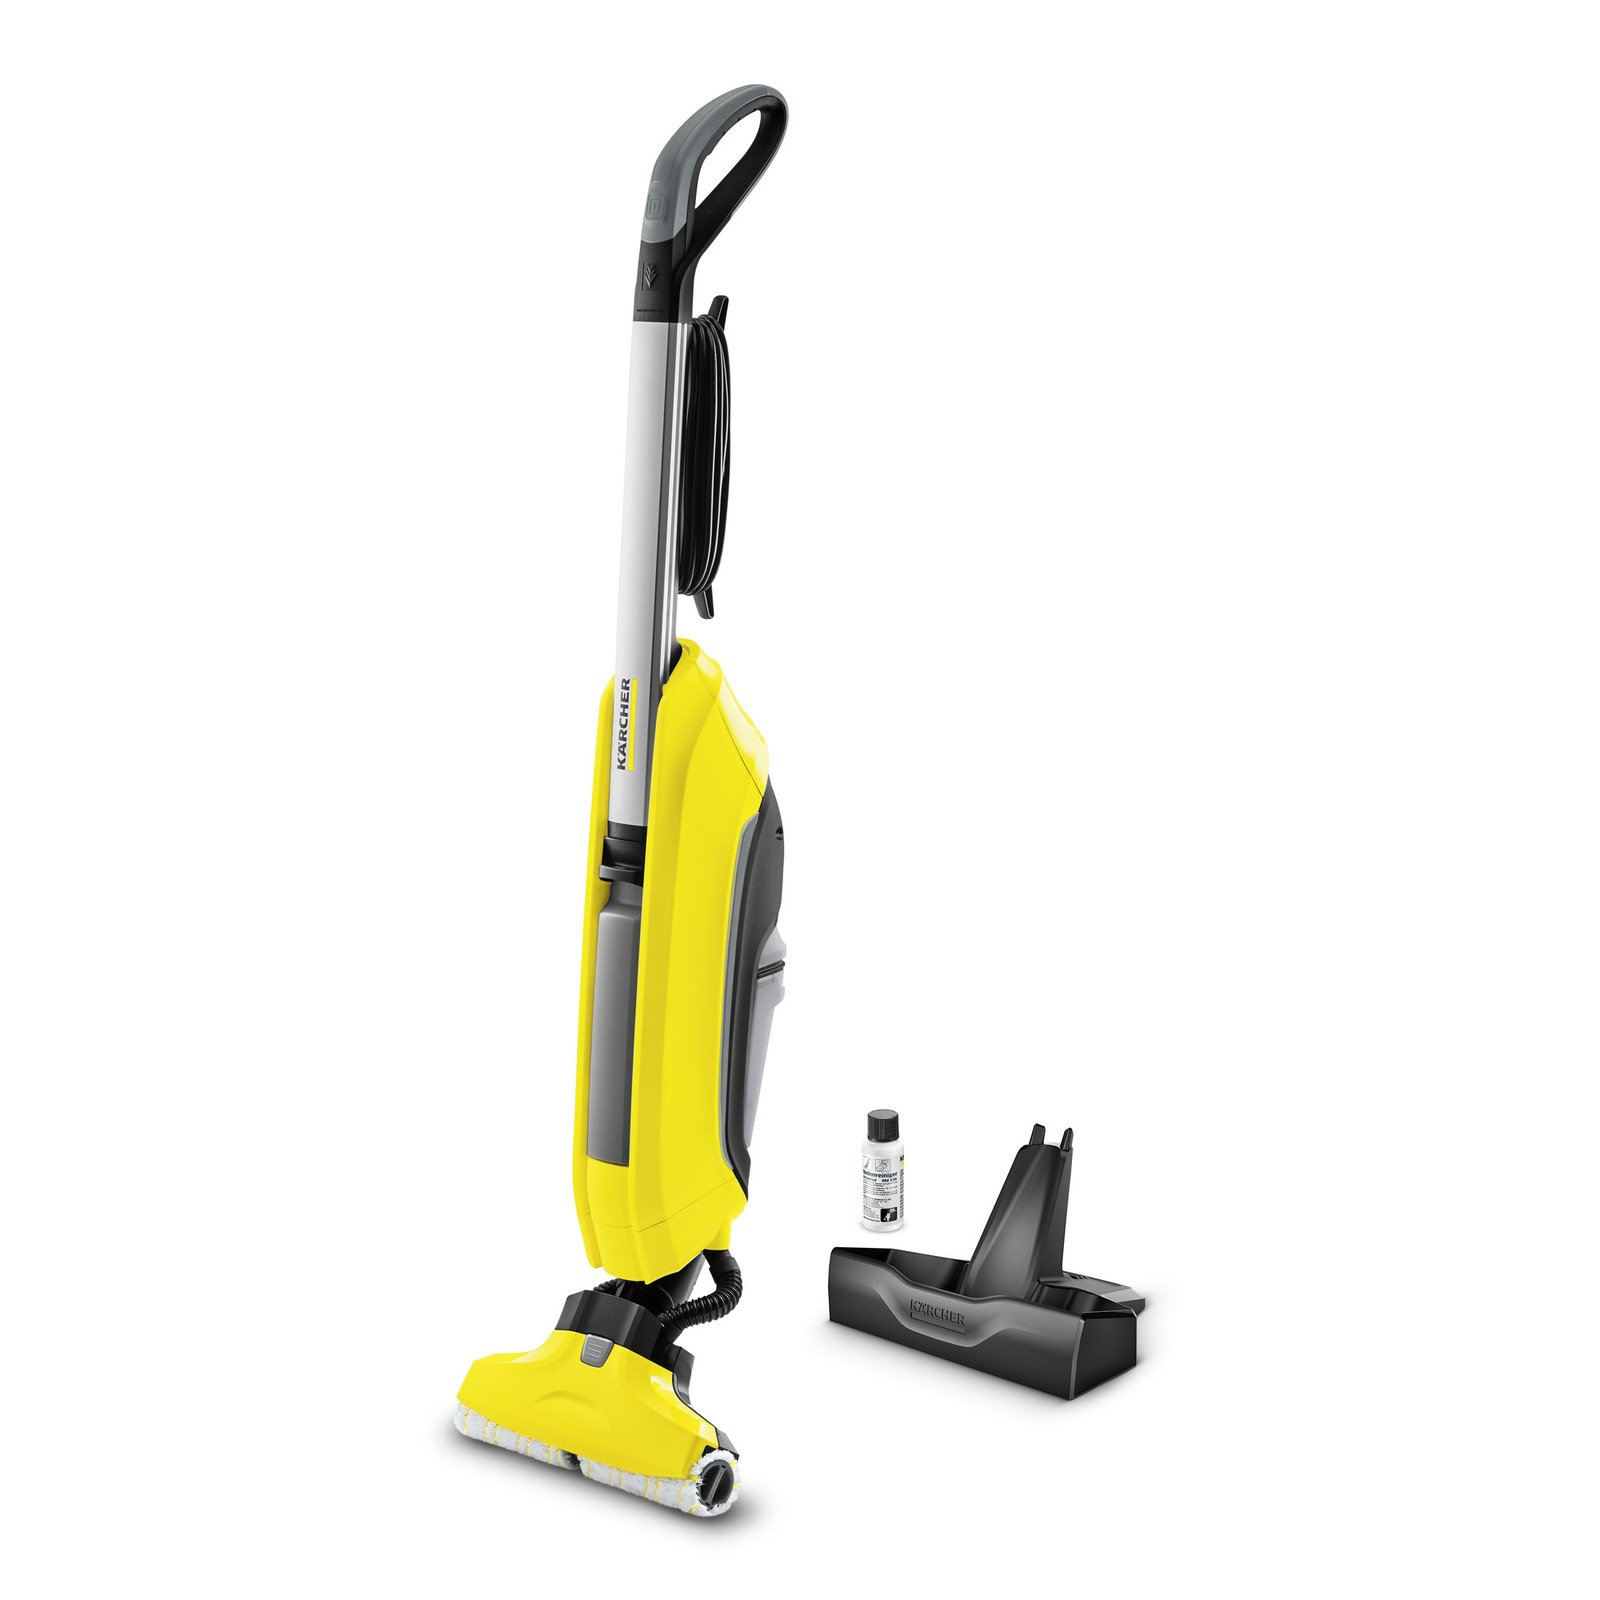 Kärcher - FC 5 Plus - Floor Cleaner